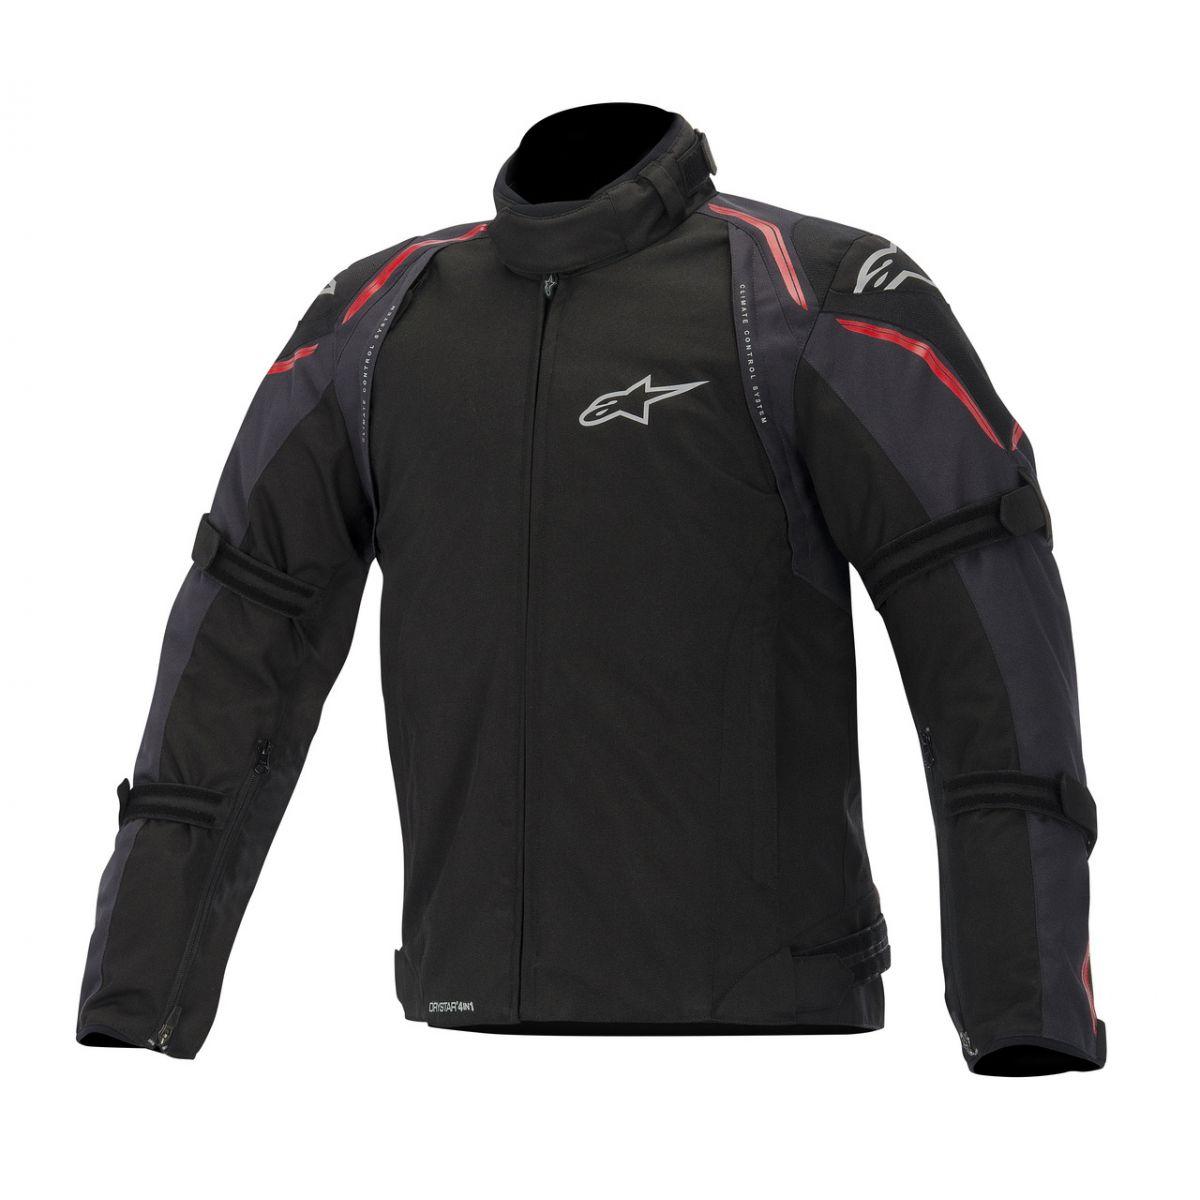 Jaqueta Alpinestars Megaton WP (Black Red/ 4 em 1)  - Super Bike - Loja Oficial Alpinestars